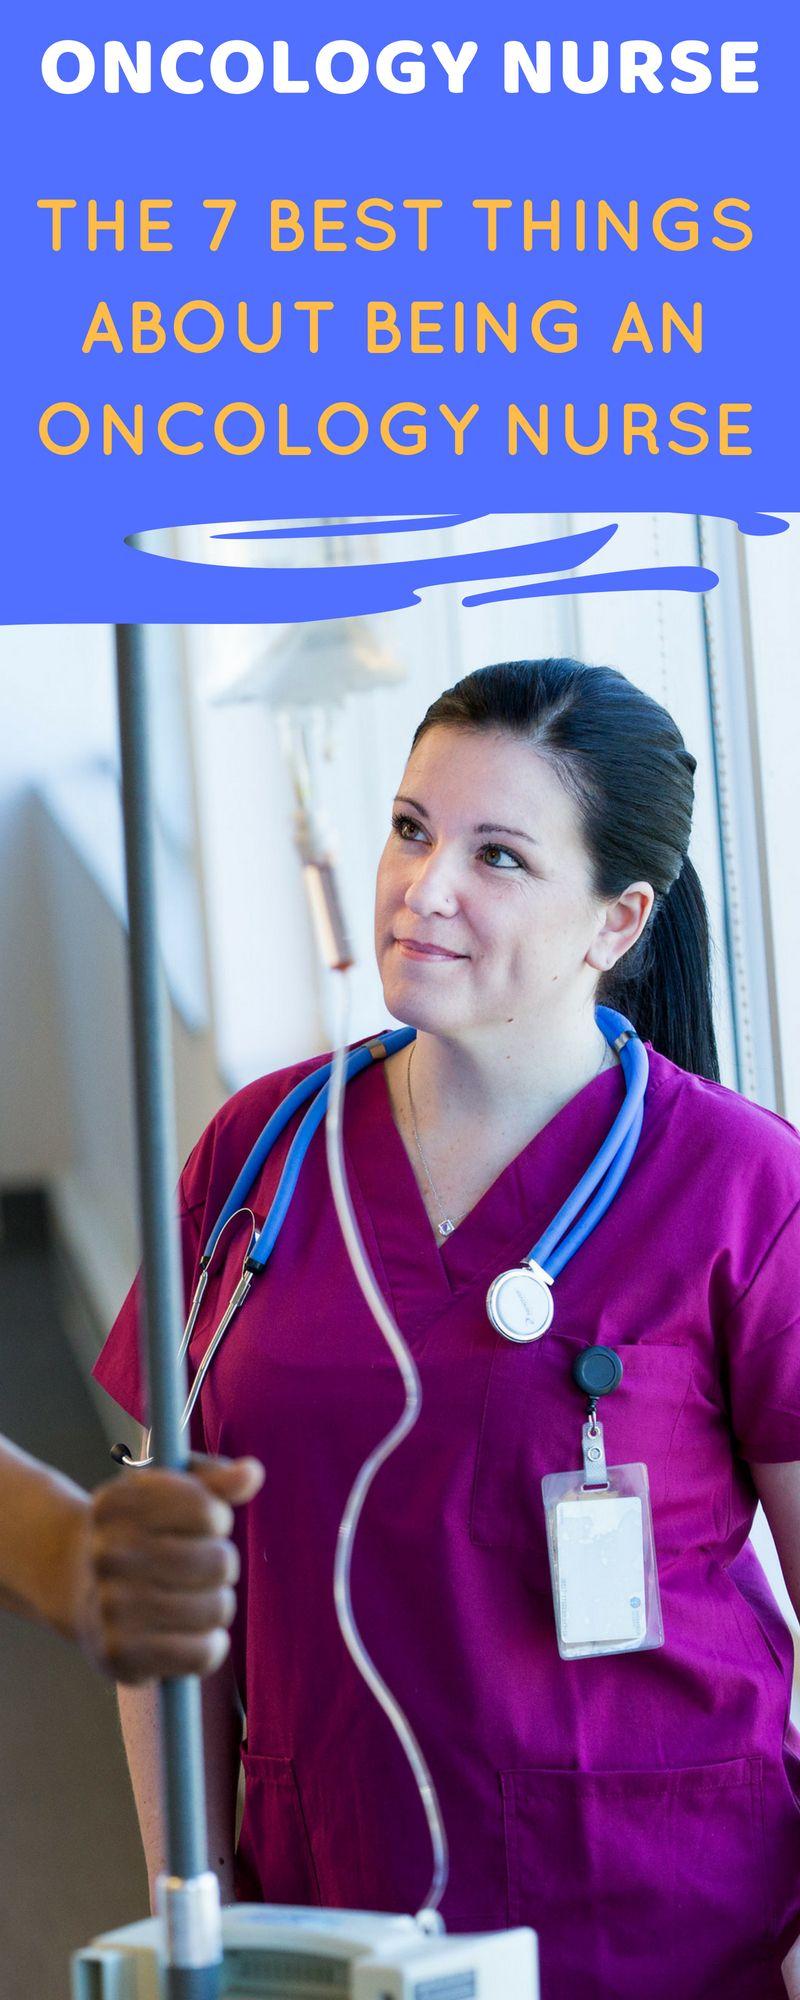 Oncology Nurse Salary, Job Description, Duties and